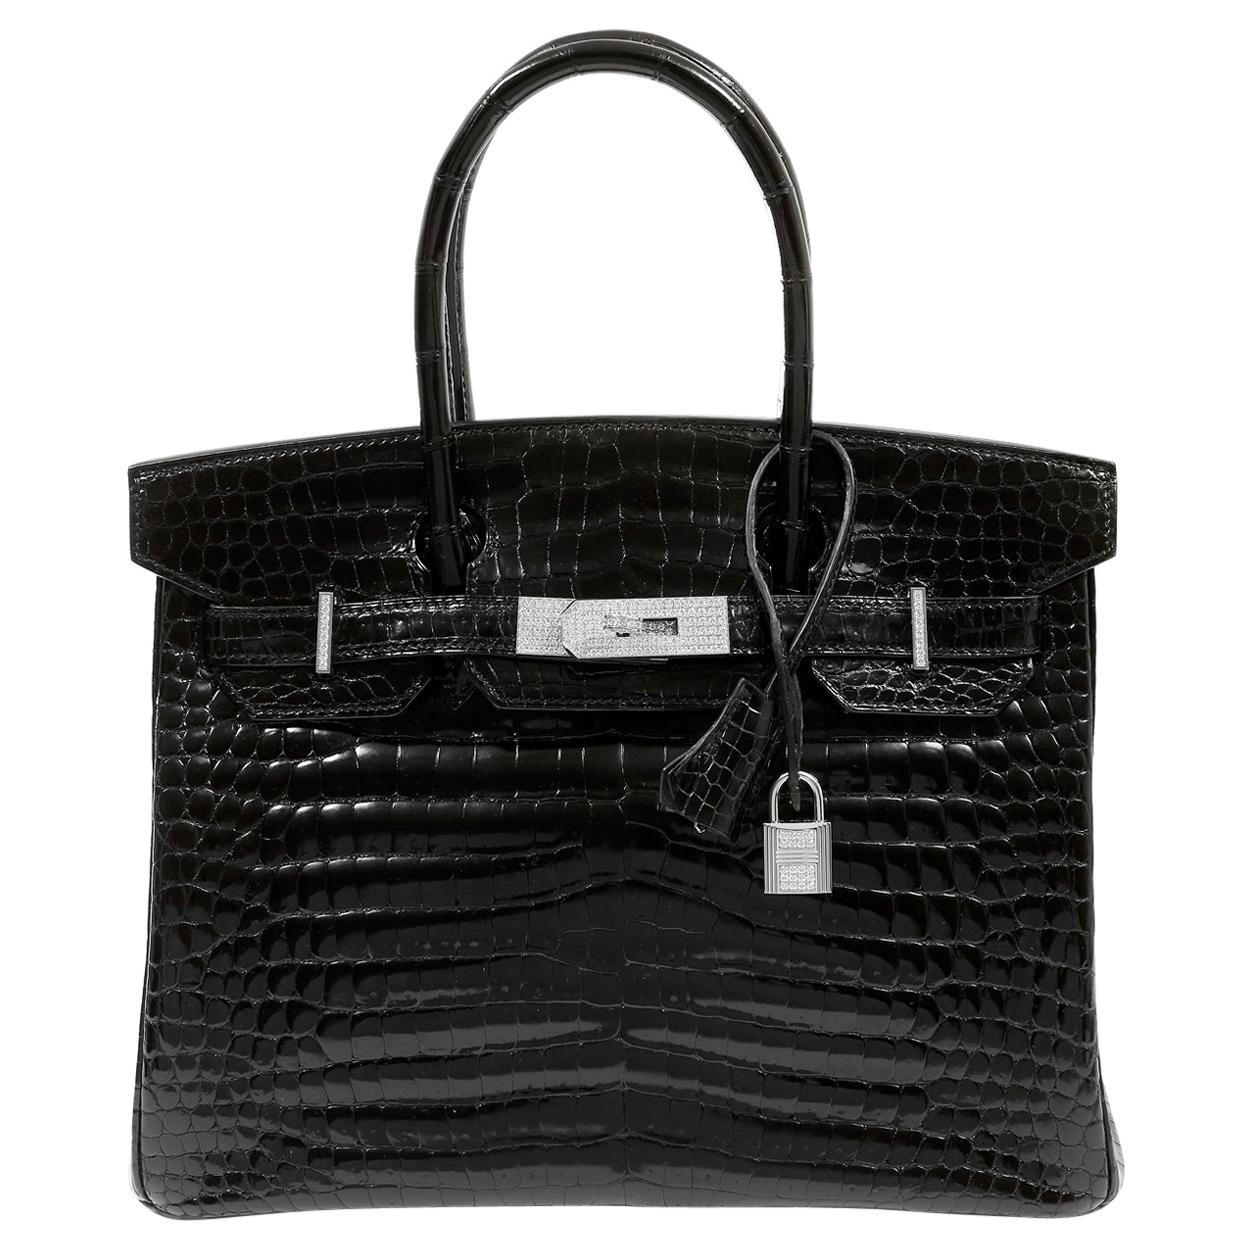 Hermès Black Crocodile 30 cm Diamond Encrusted Birkin Bag